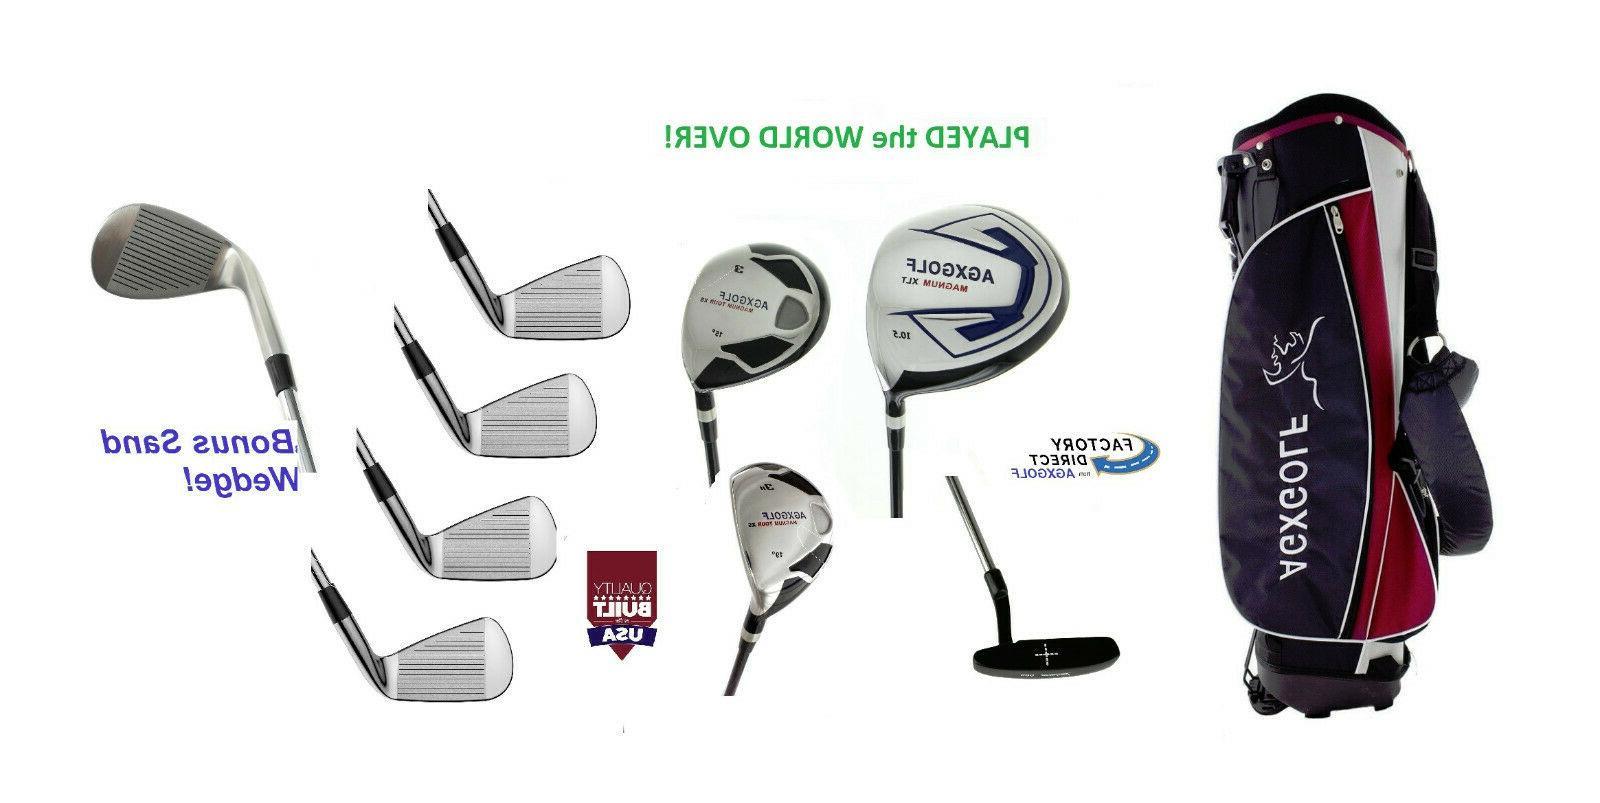 2 men s executive golf club set